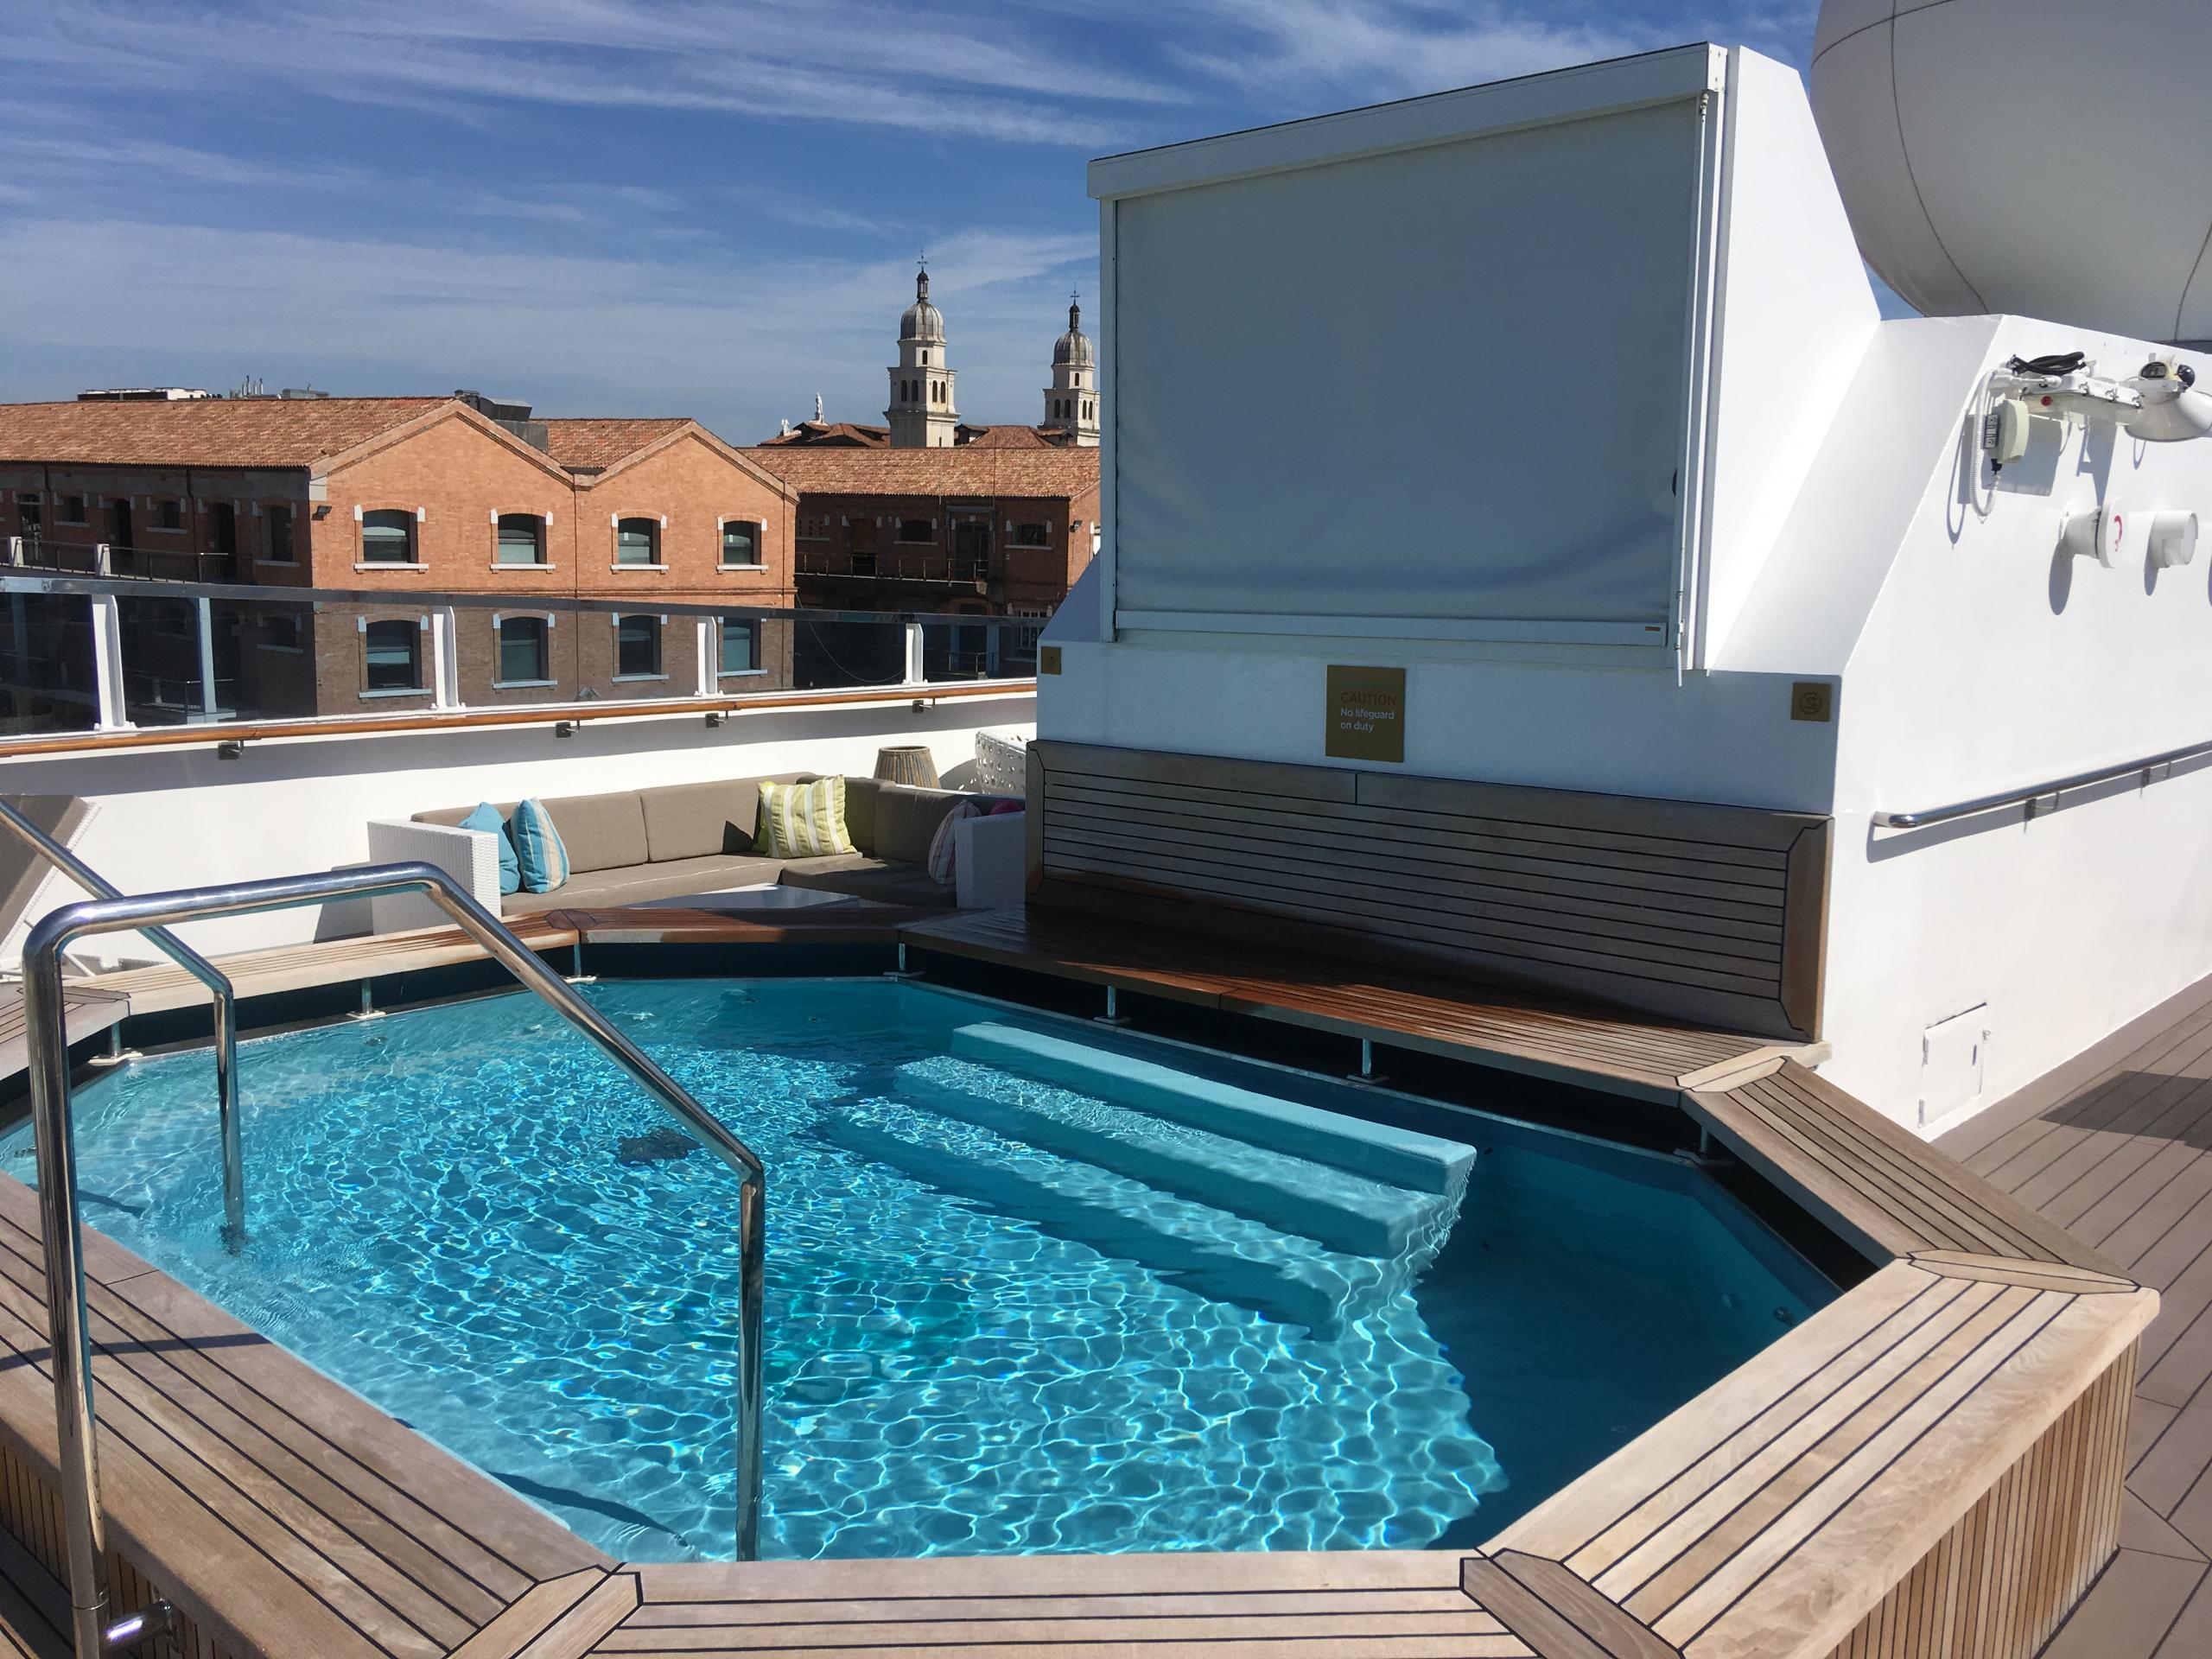 Splash pool onboard luxury yacht Crystal Esprit.